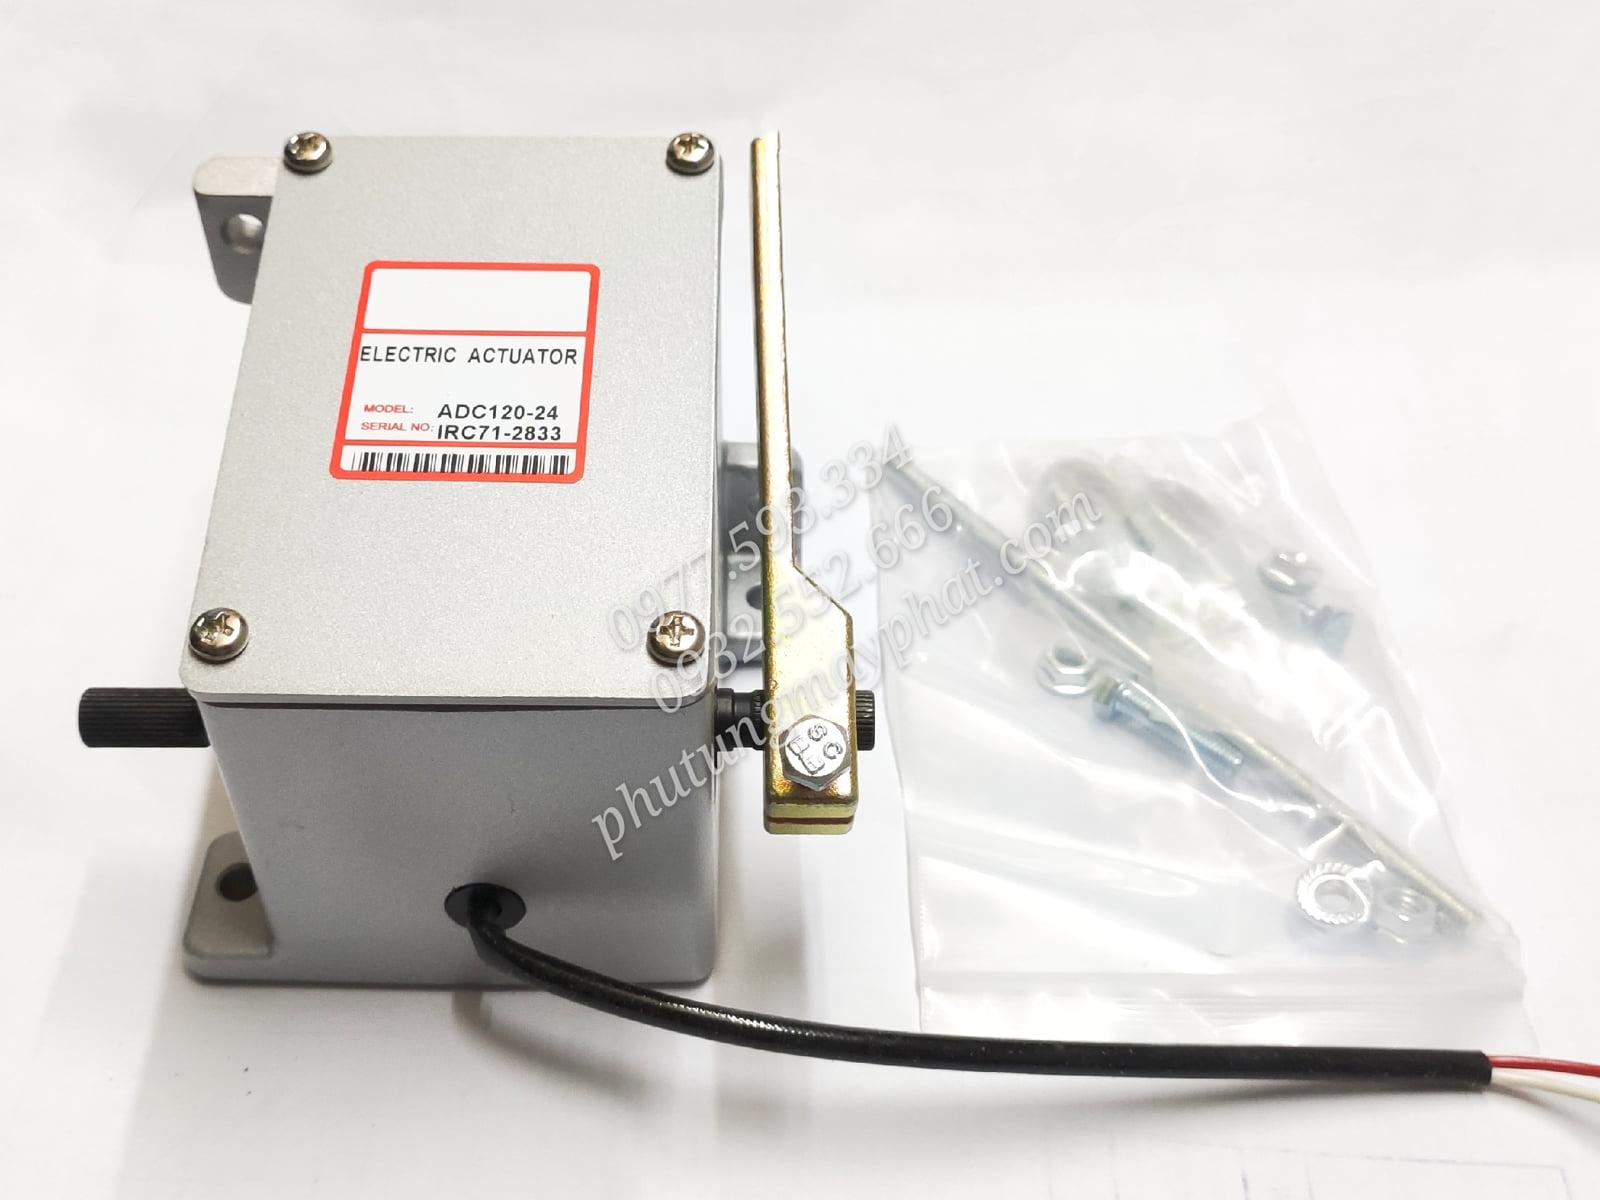 ADC120-24